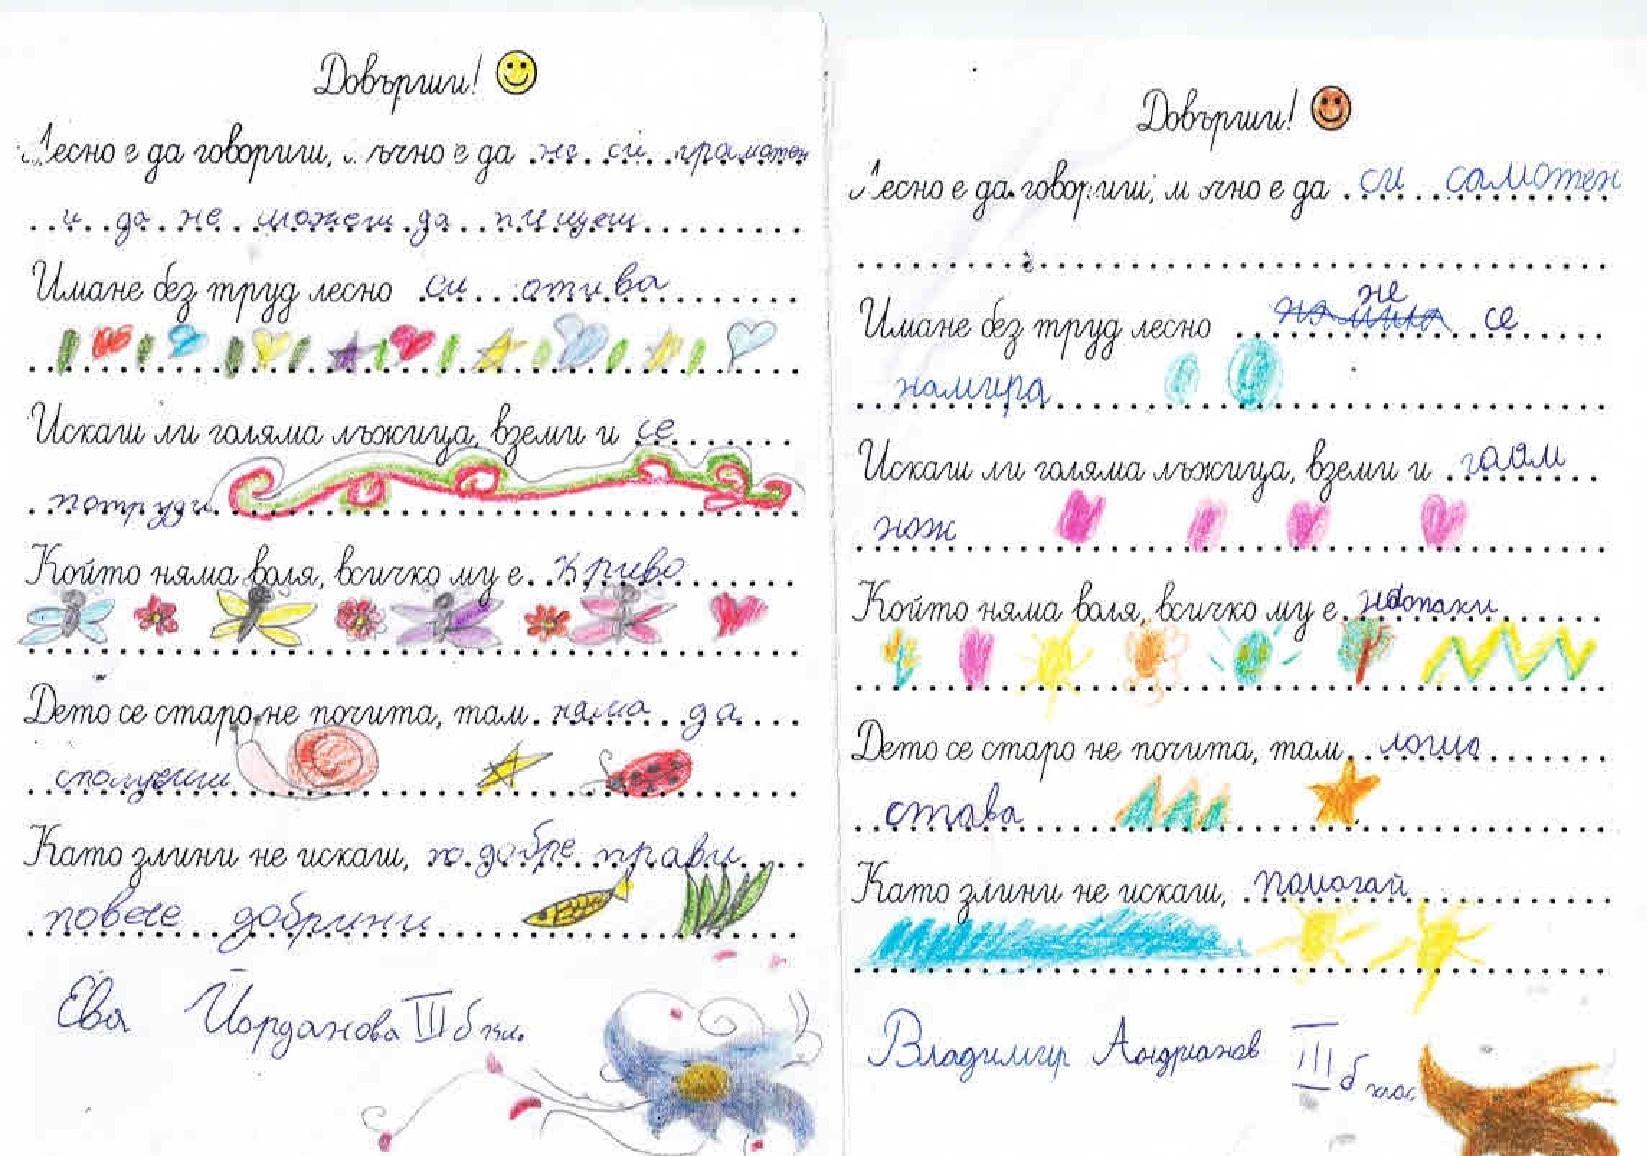 ДОВЪРШВАМЕ ПОСЛОВИЦИ И ПОГОВОРКИ, 3.б клас § 4.в клас by Shermin Ahmedova - Ourboox.com